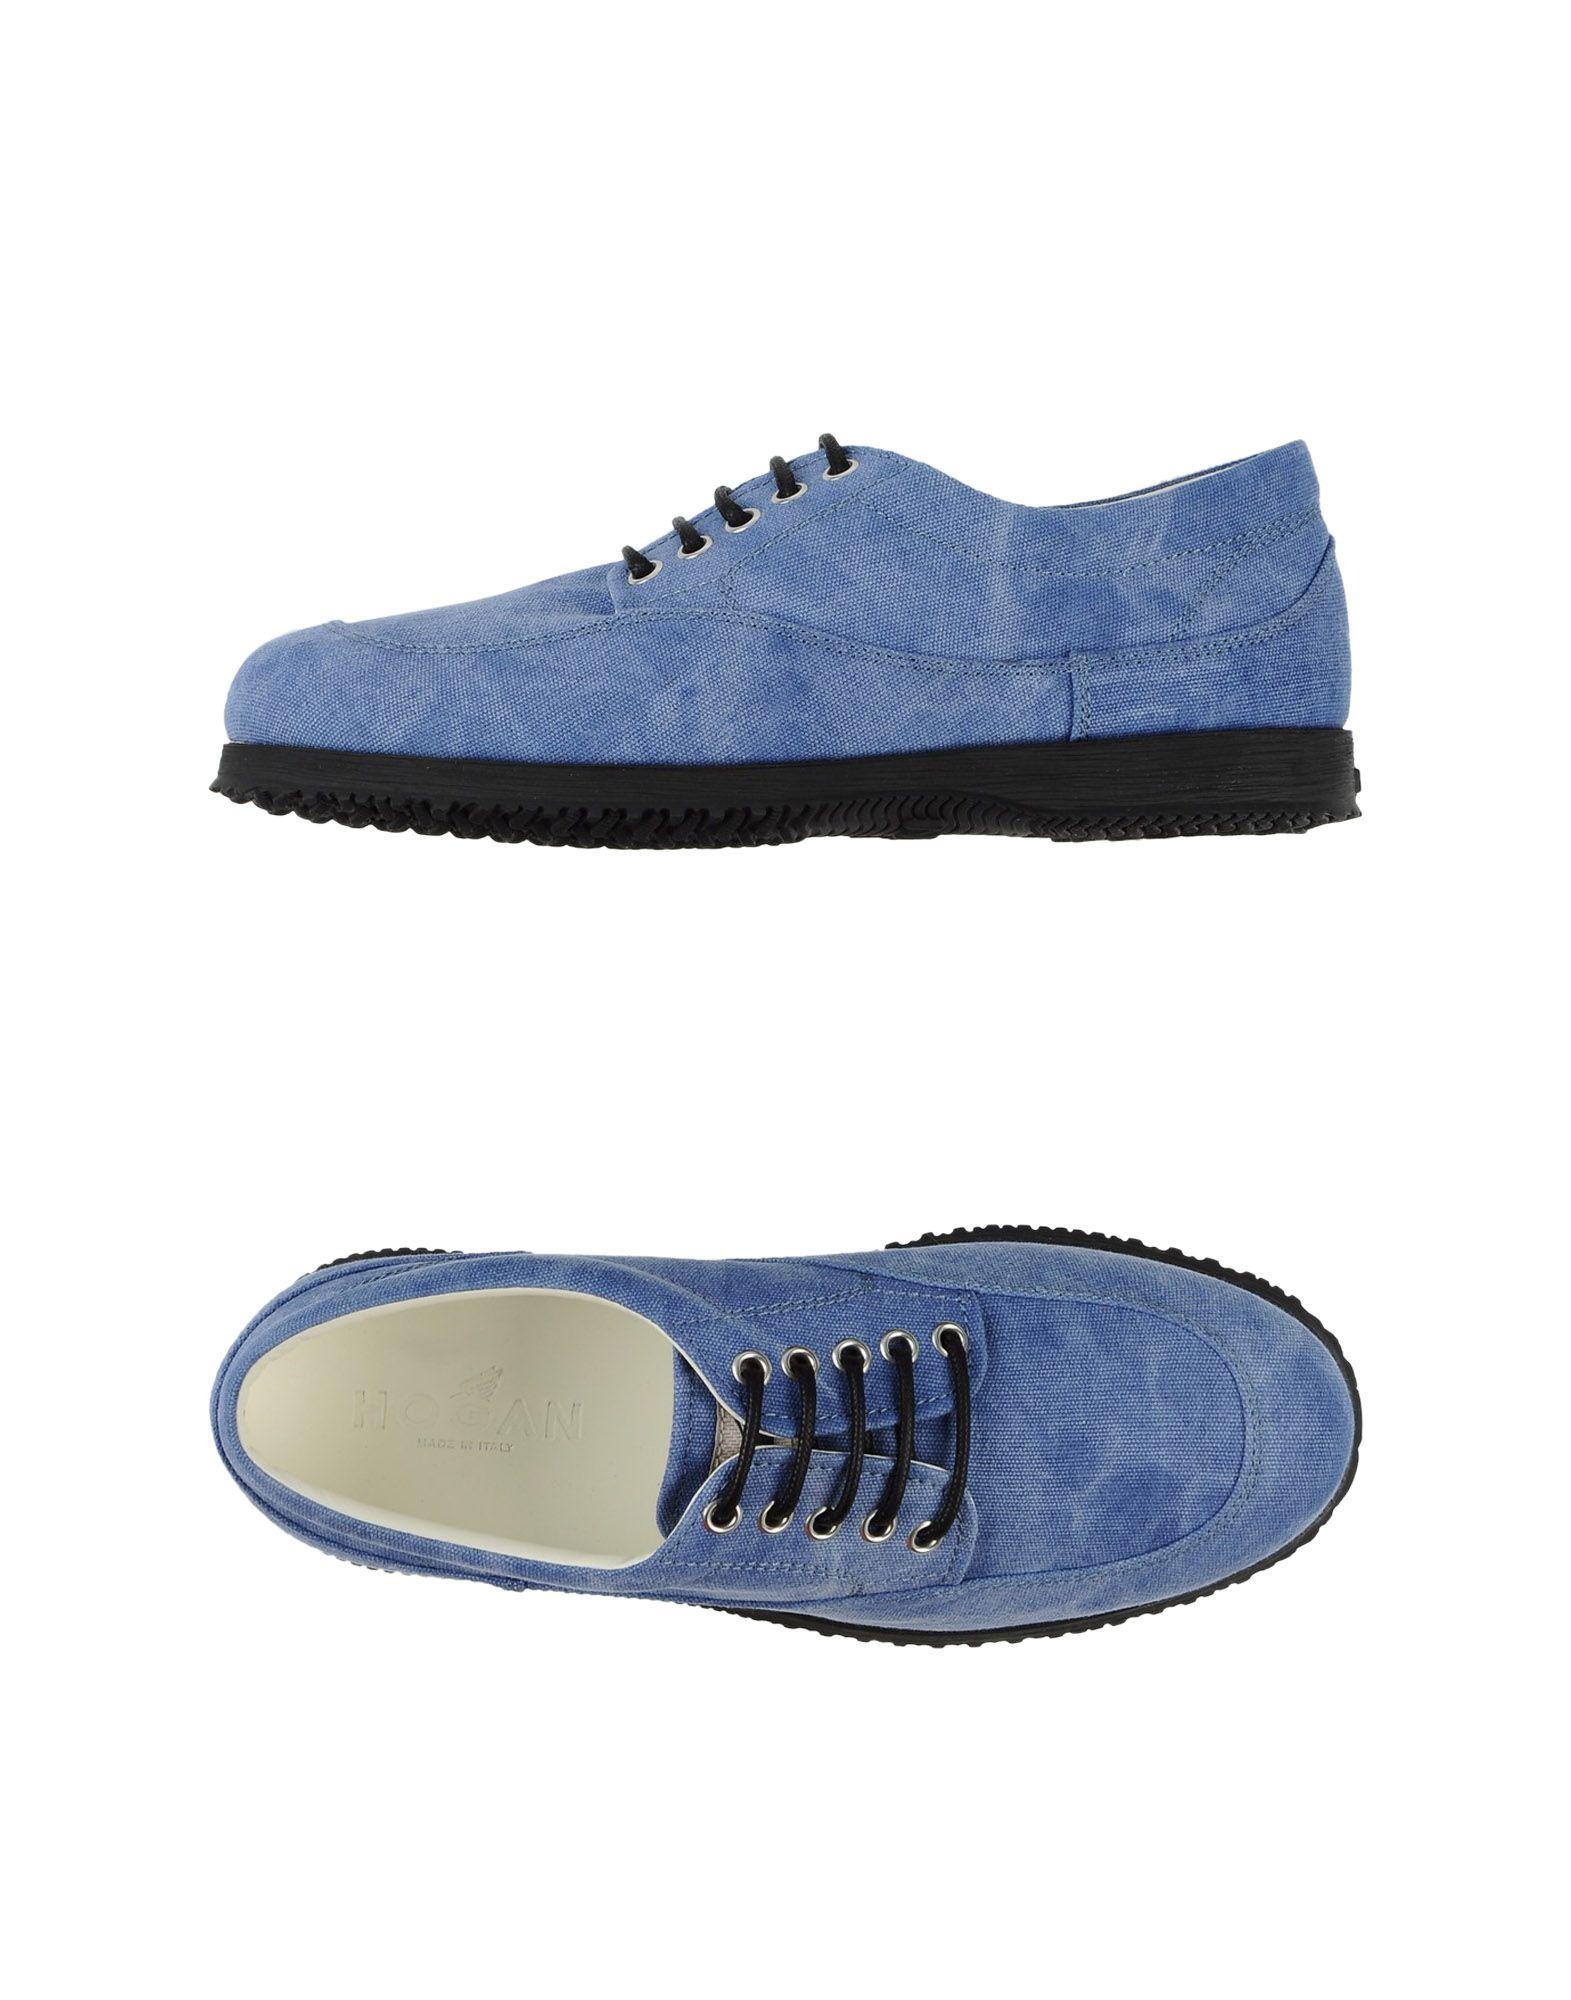 calzature hogan in offerta